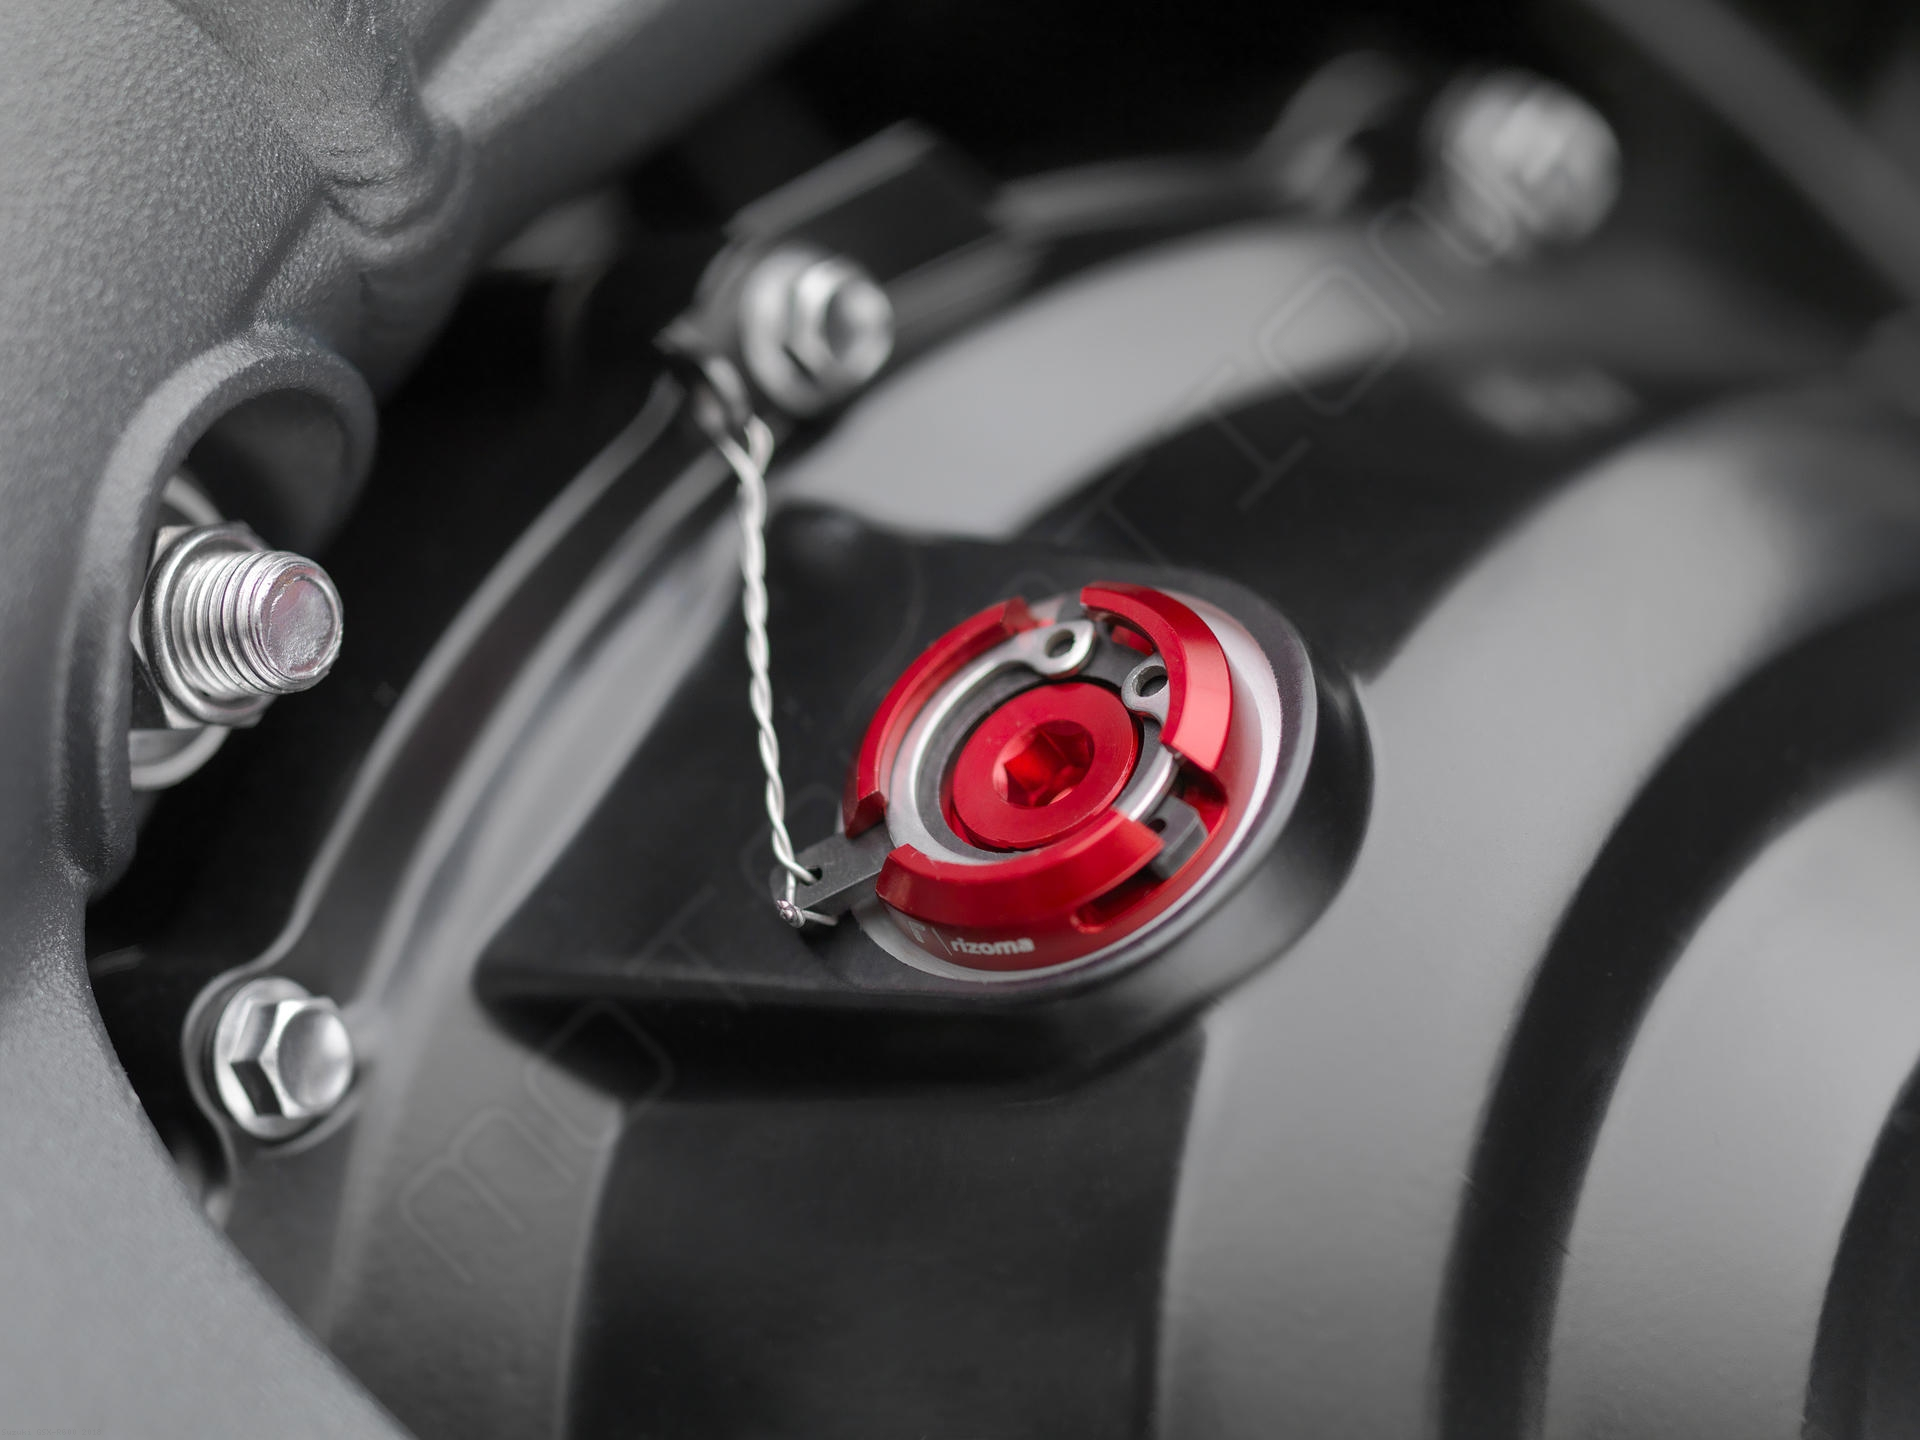 ... Rizoma Engine Oil Filler Cap TP009 Suzuki / GSX R600 / 2018 ...